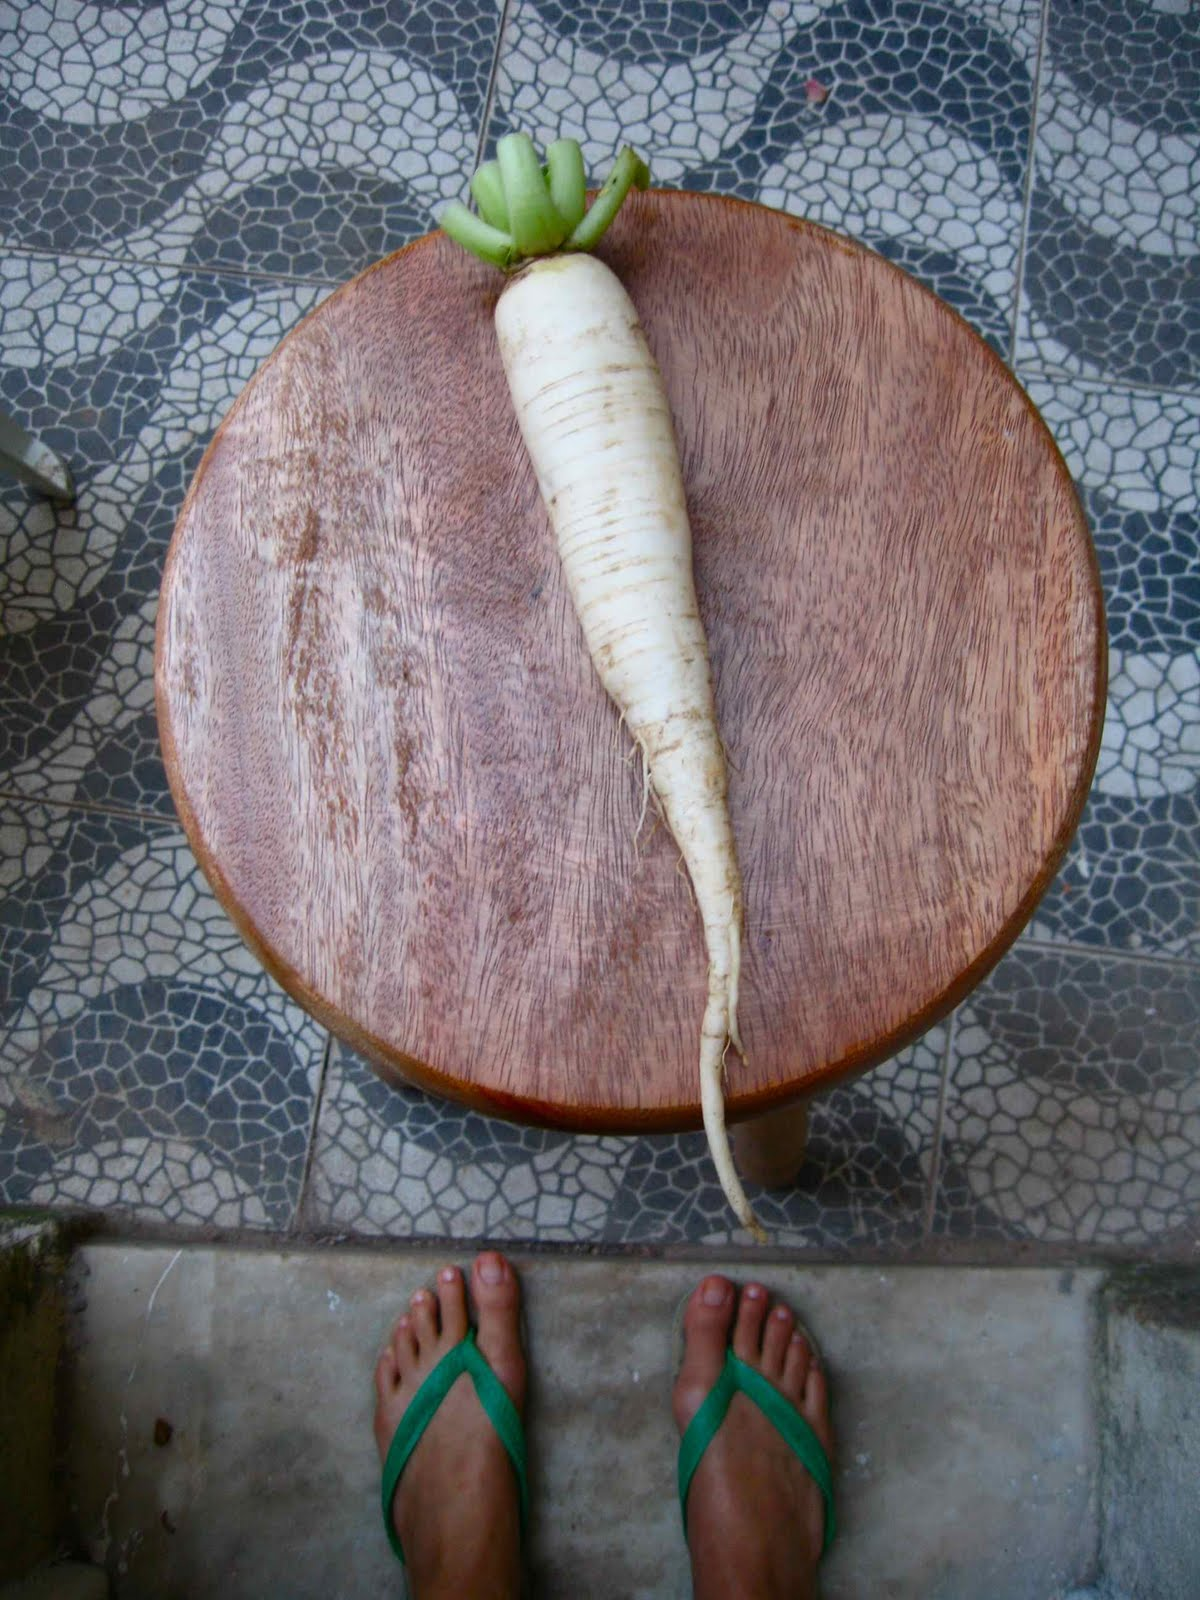 Weird White Vegetables 9